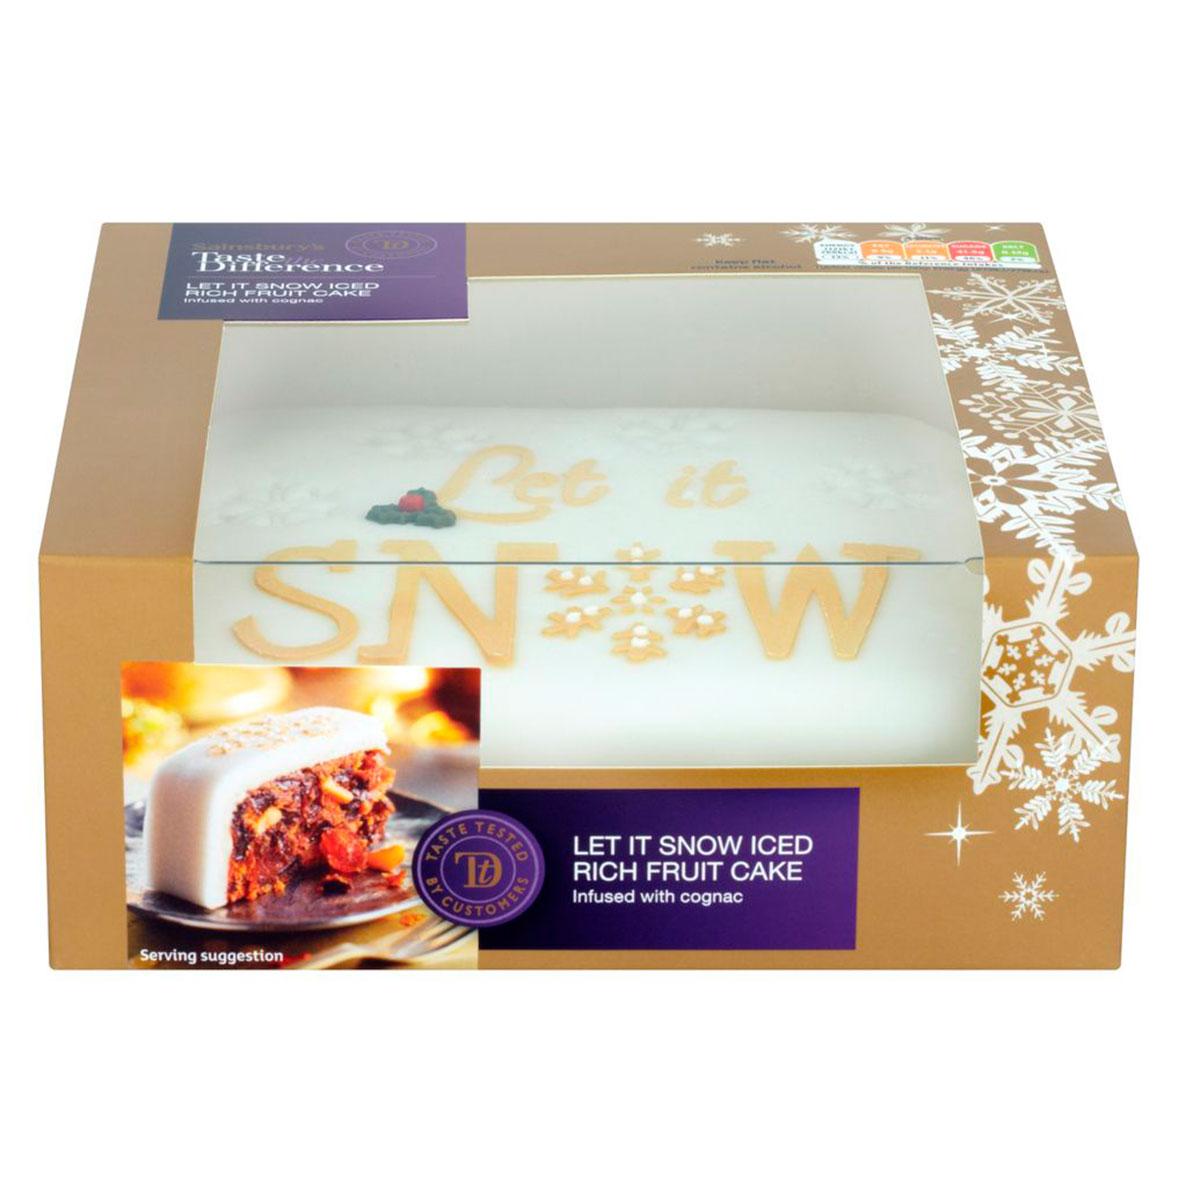 sainsburys sainsbury 39 s let it snow iced christmas cake. Black Bedroom Furniture Sets. Home Design Ideas